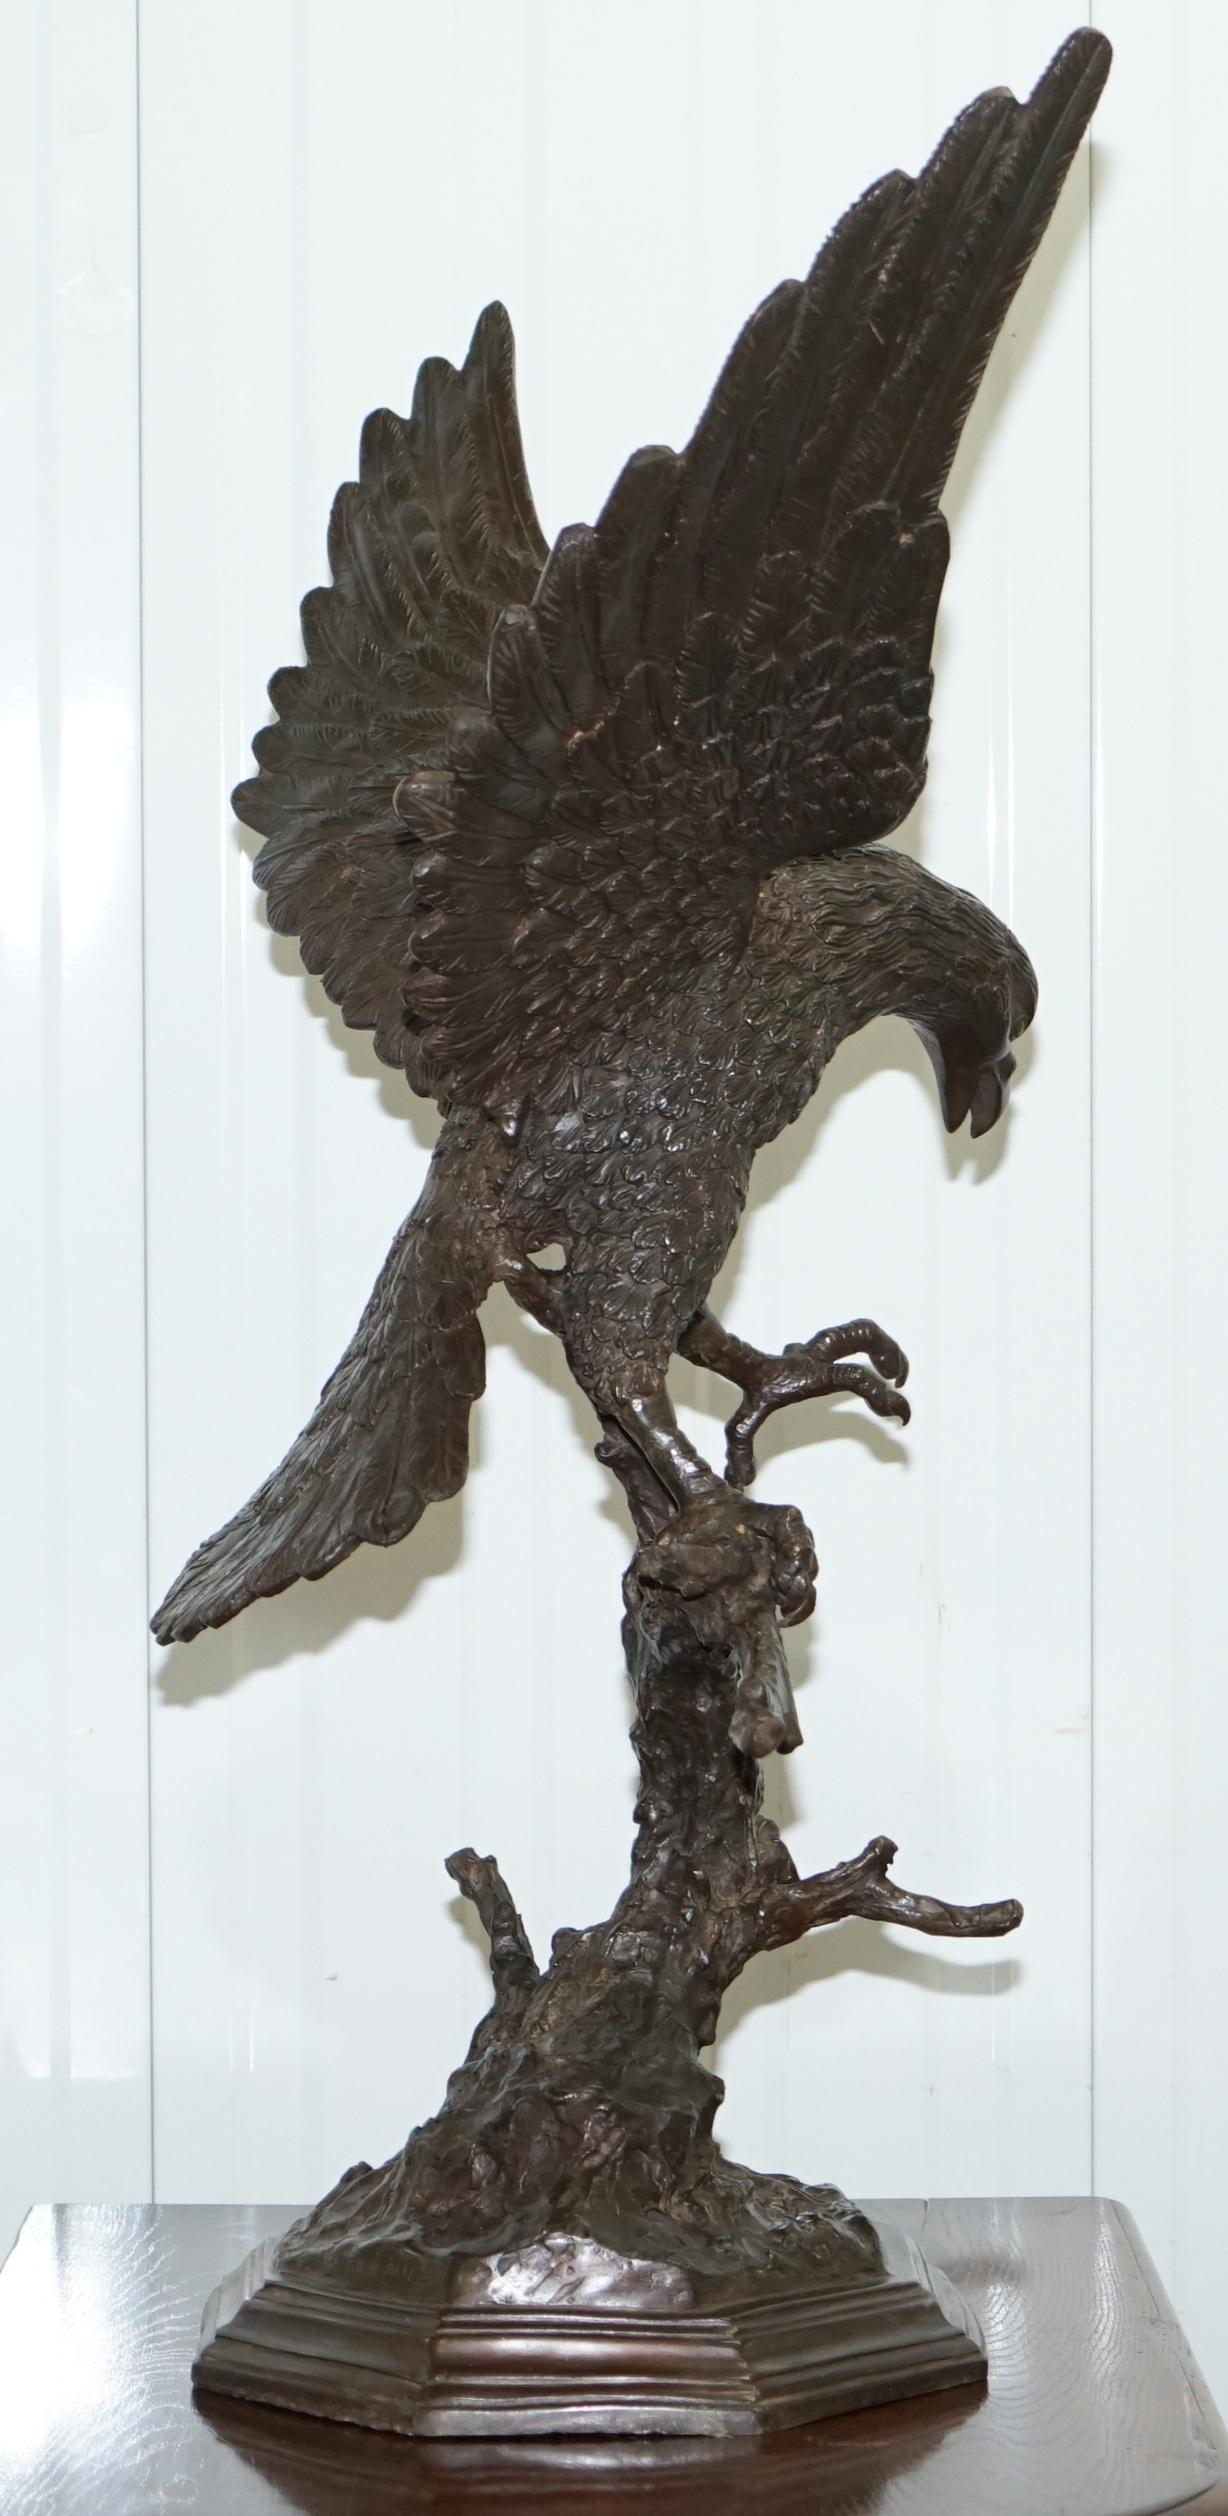 rare Old China solid bronze eagle statue